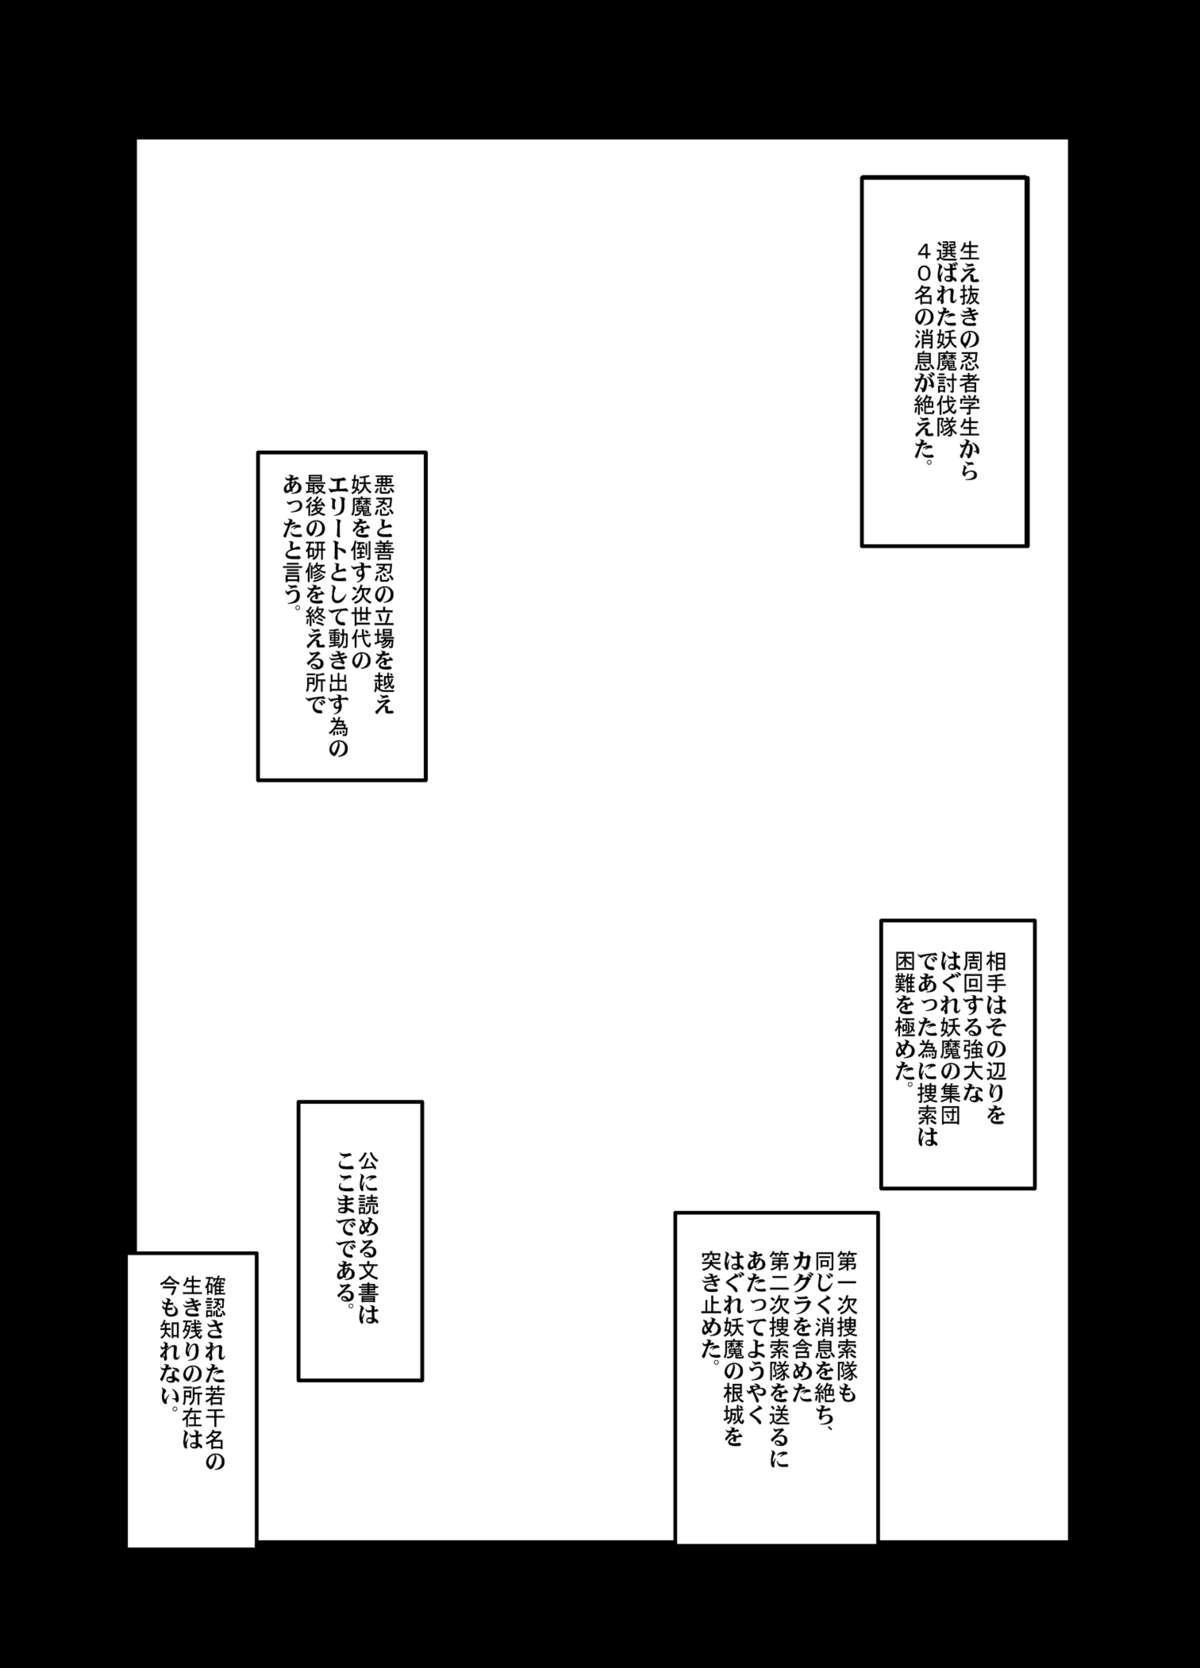 Otome Ninpouchou Shoujo Sange 1